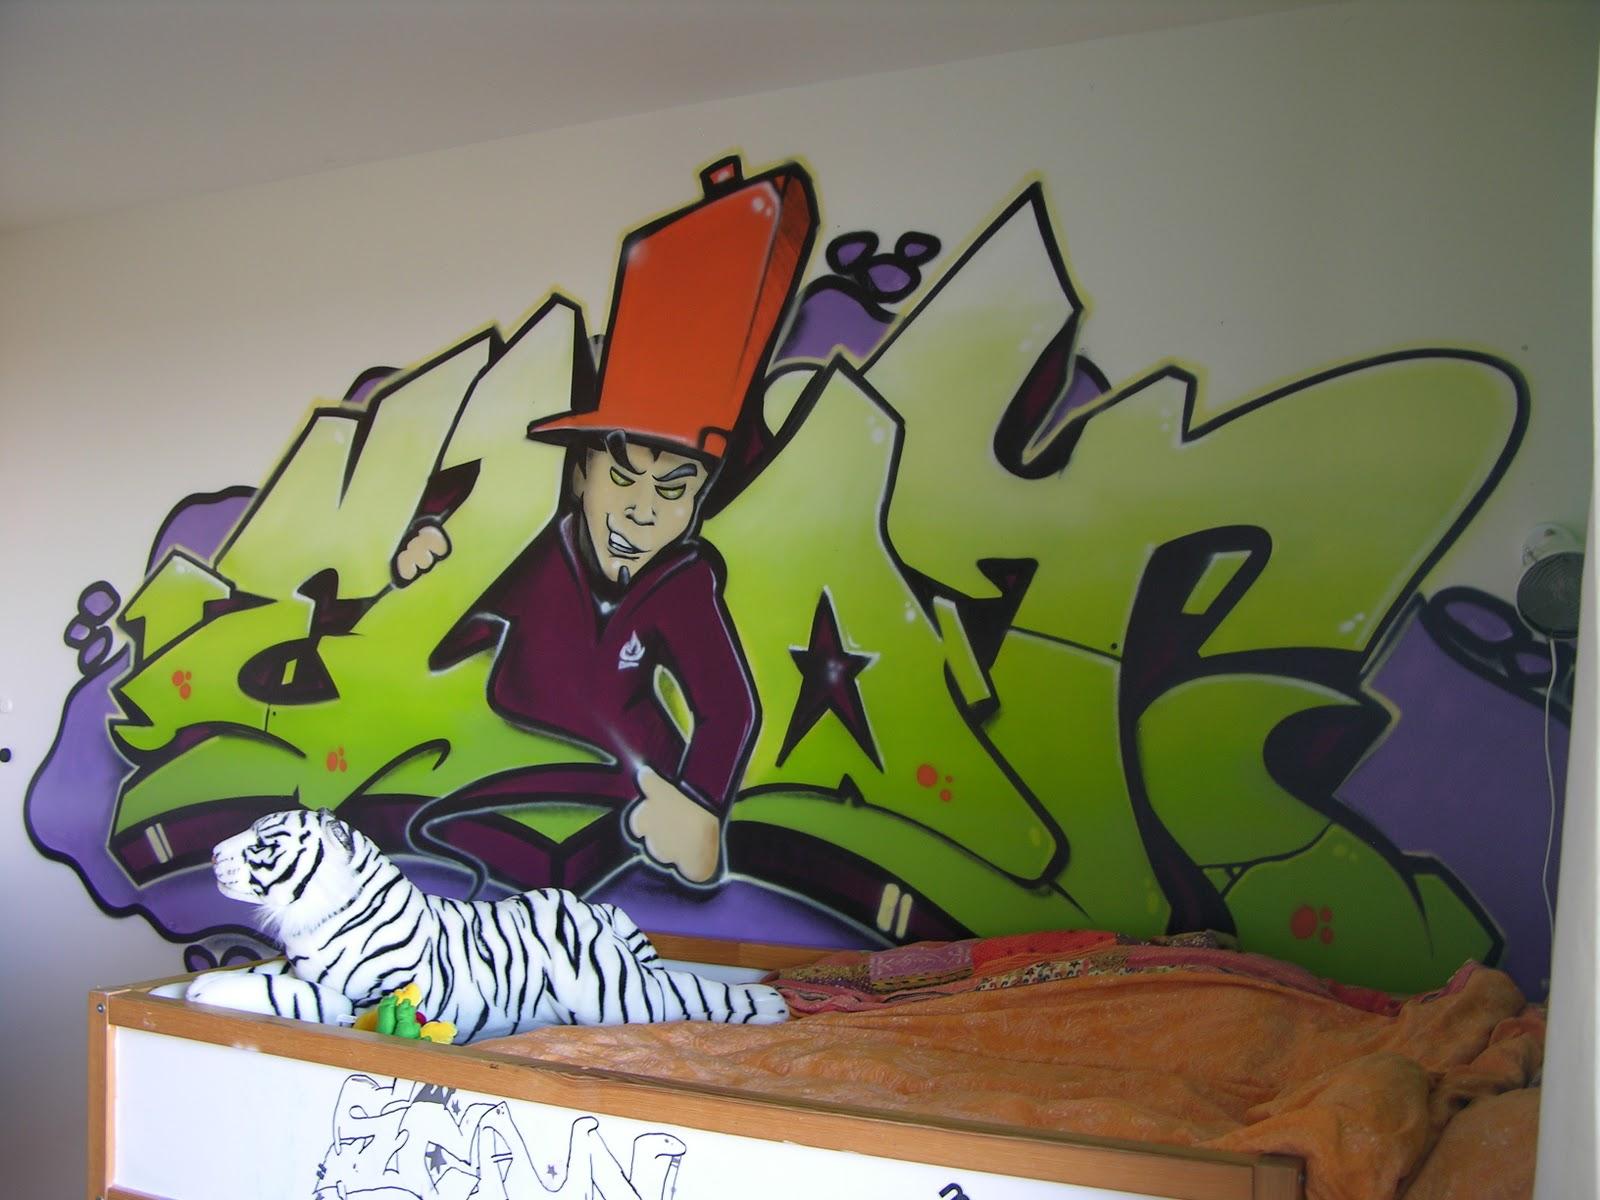 Graffiti dans une chambre d 39 enfant - Graffiti prenom gratuit ...